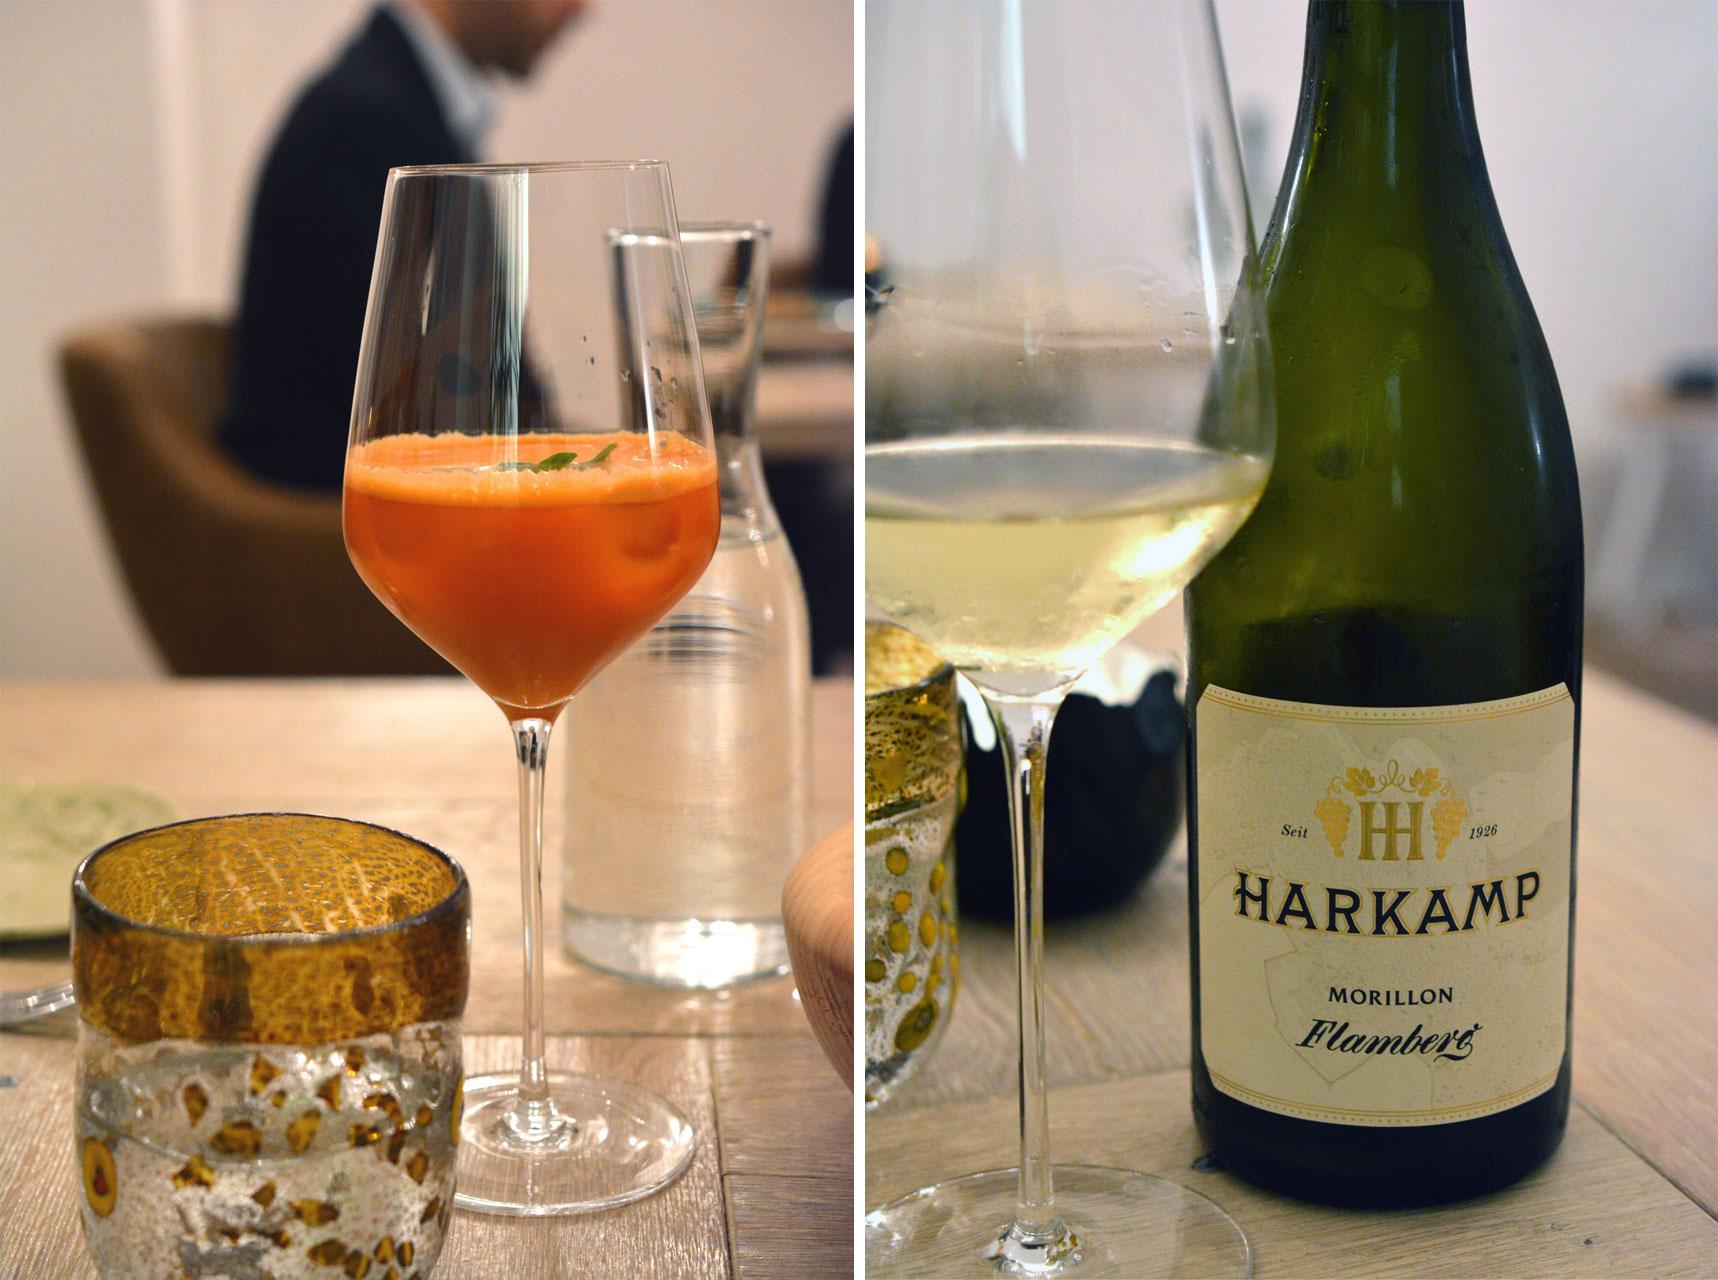 Karotten-Apfelsaft & Harkamp Morillon Flamberg